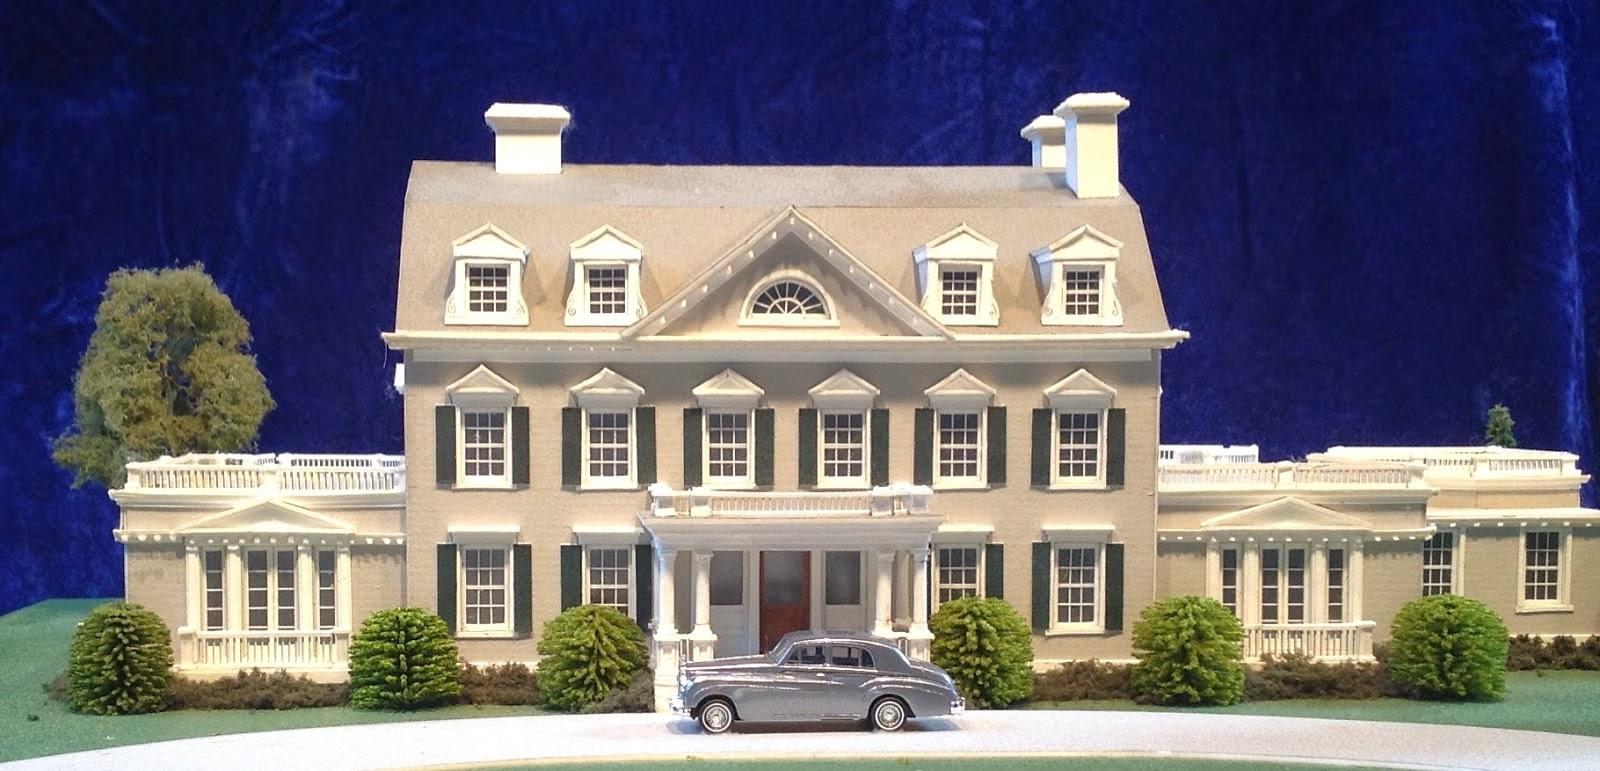 Hampton house model